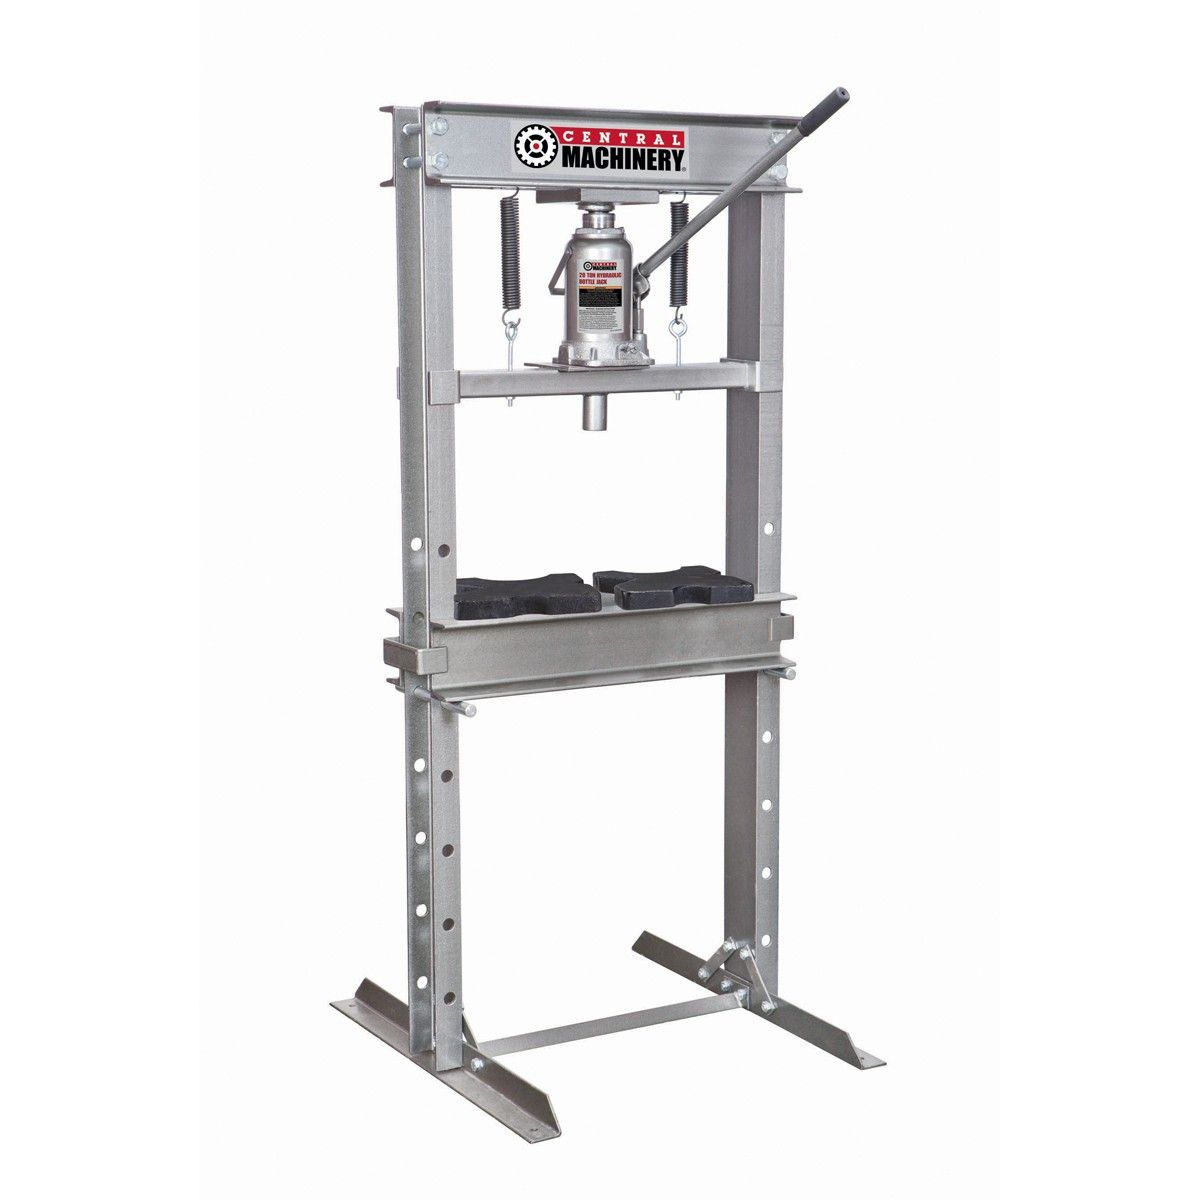 20 Ton H Frame Industrial Heavy Duty Floor Shop Press